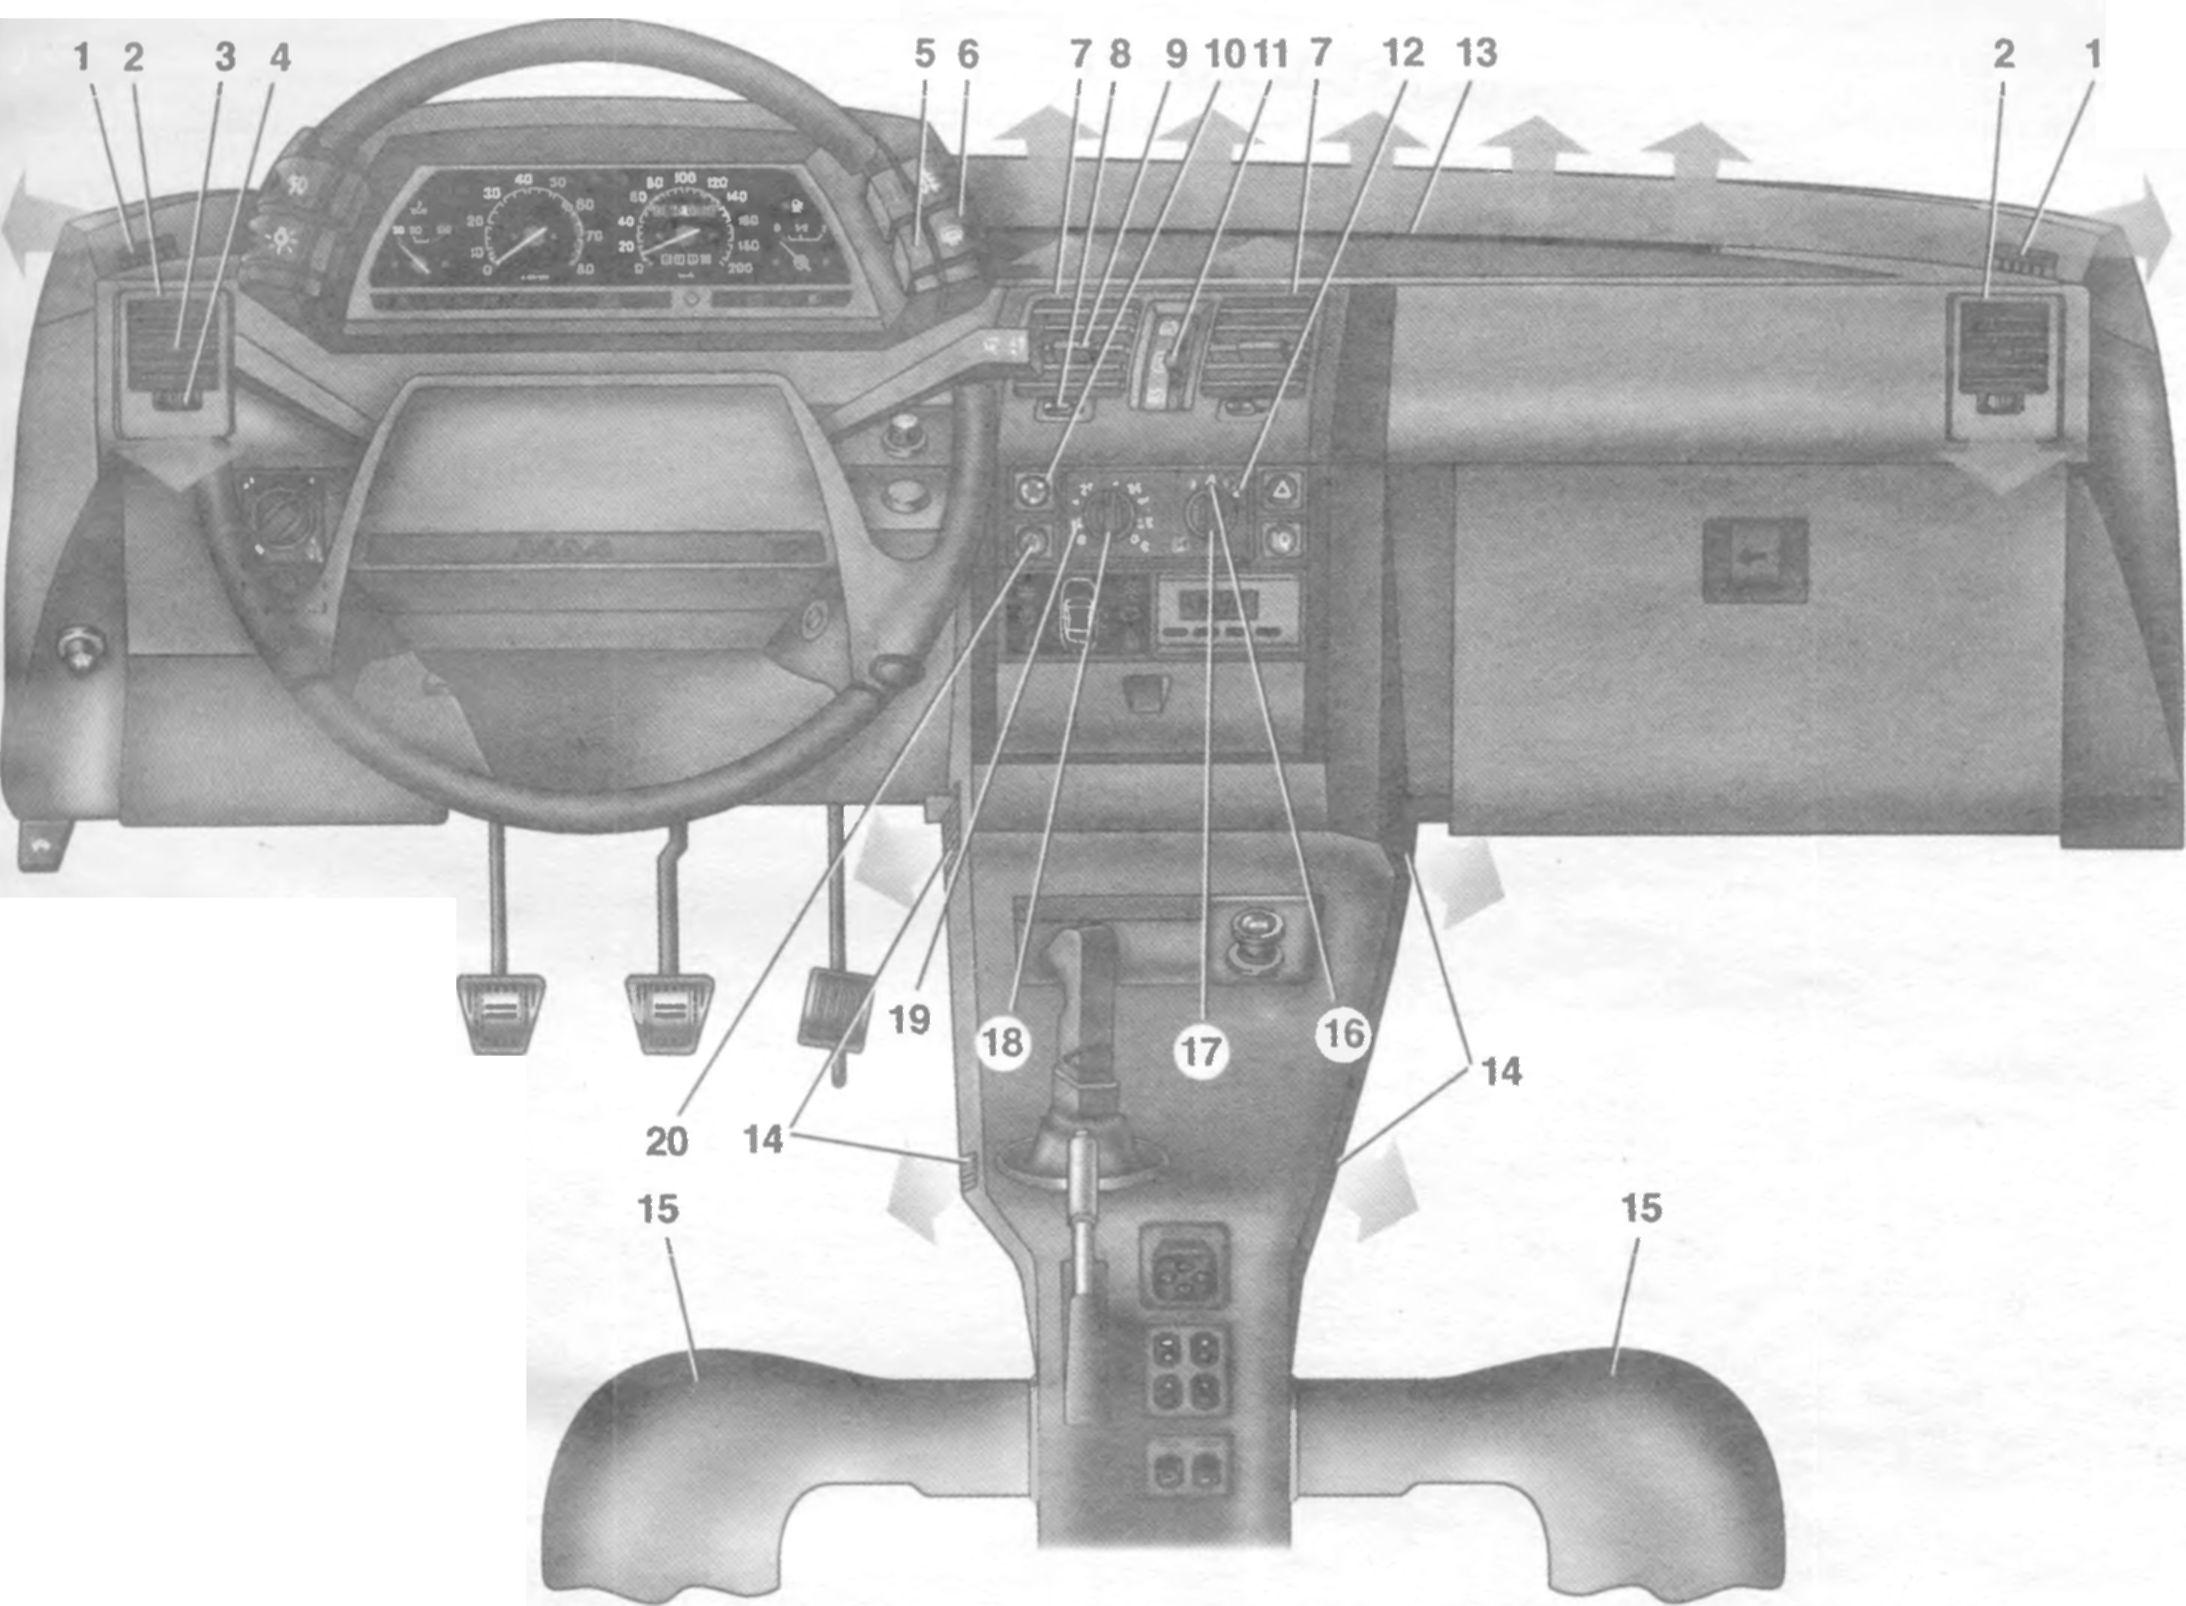 Схемы аккумуляторов схема обдува стекла ваз 21124.  Ваз 2107 схема коробки передач.